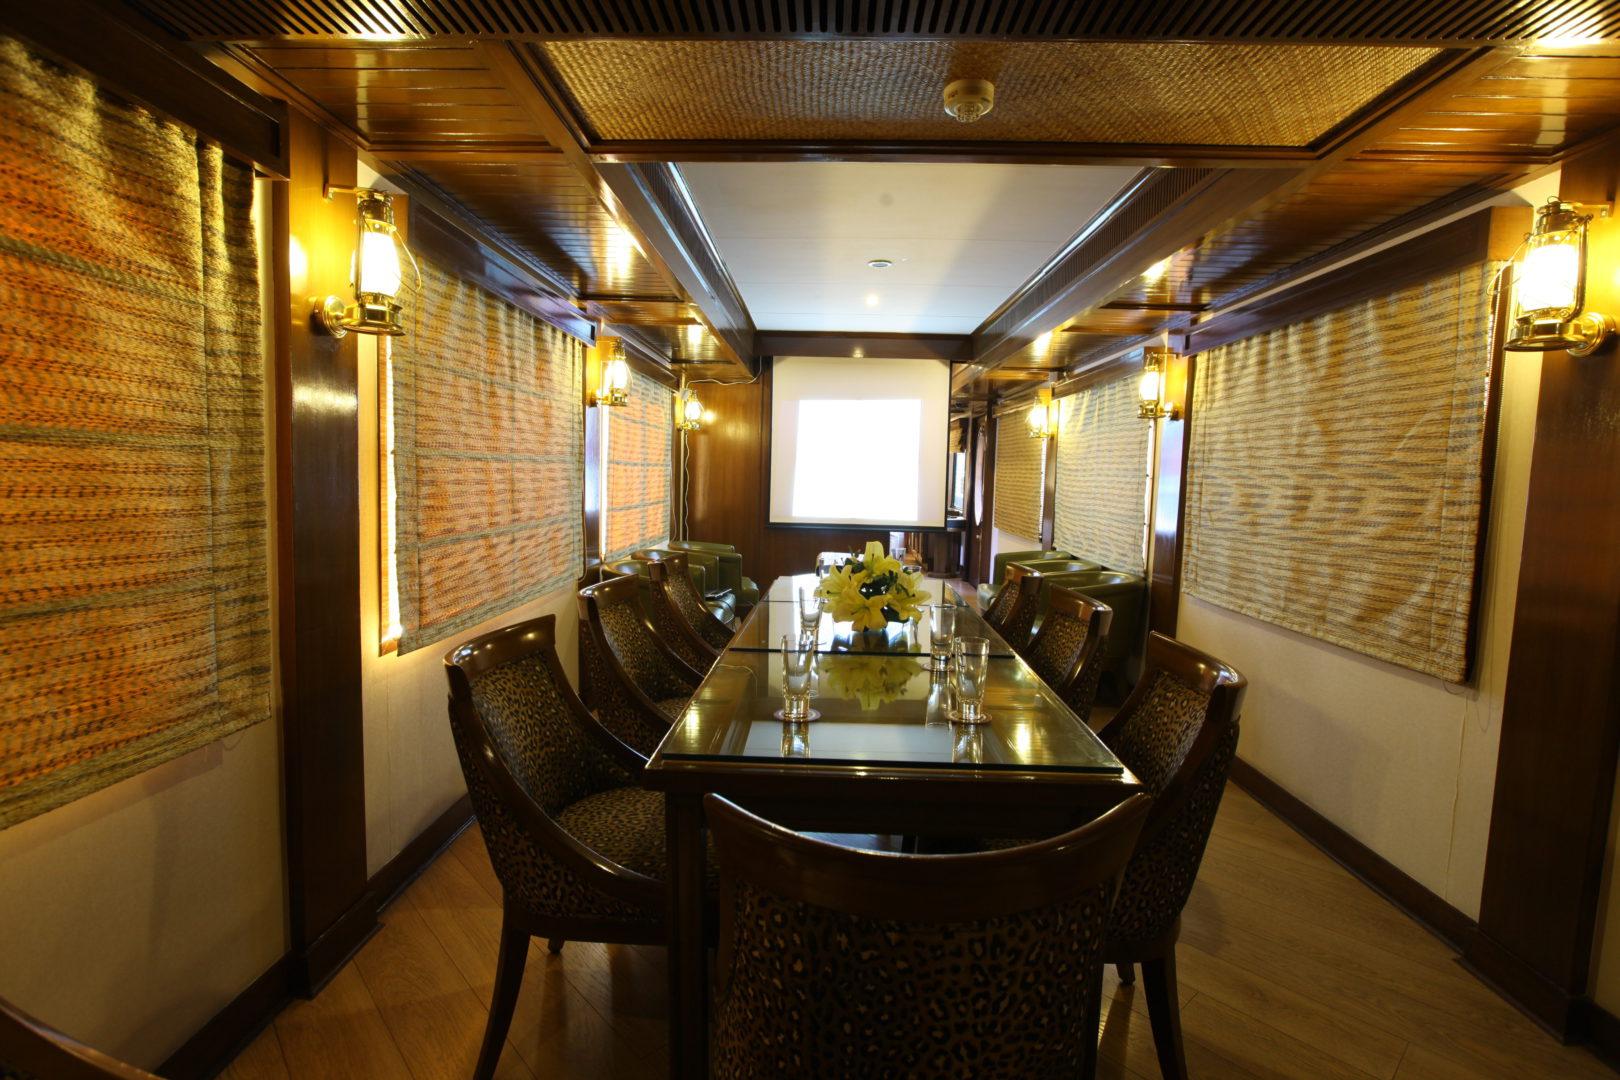 Safari-bar-as-conference-room